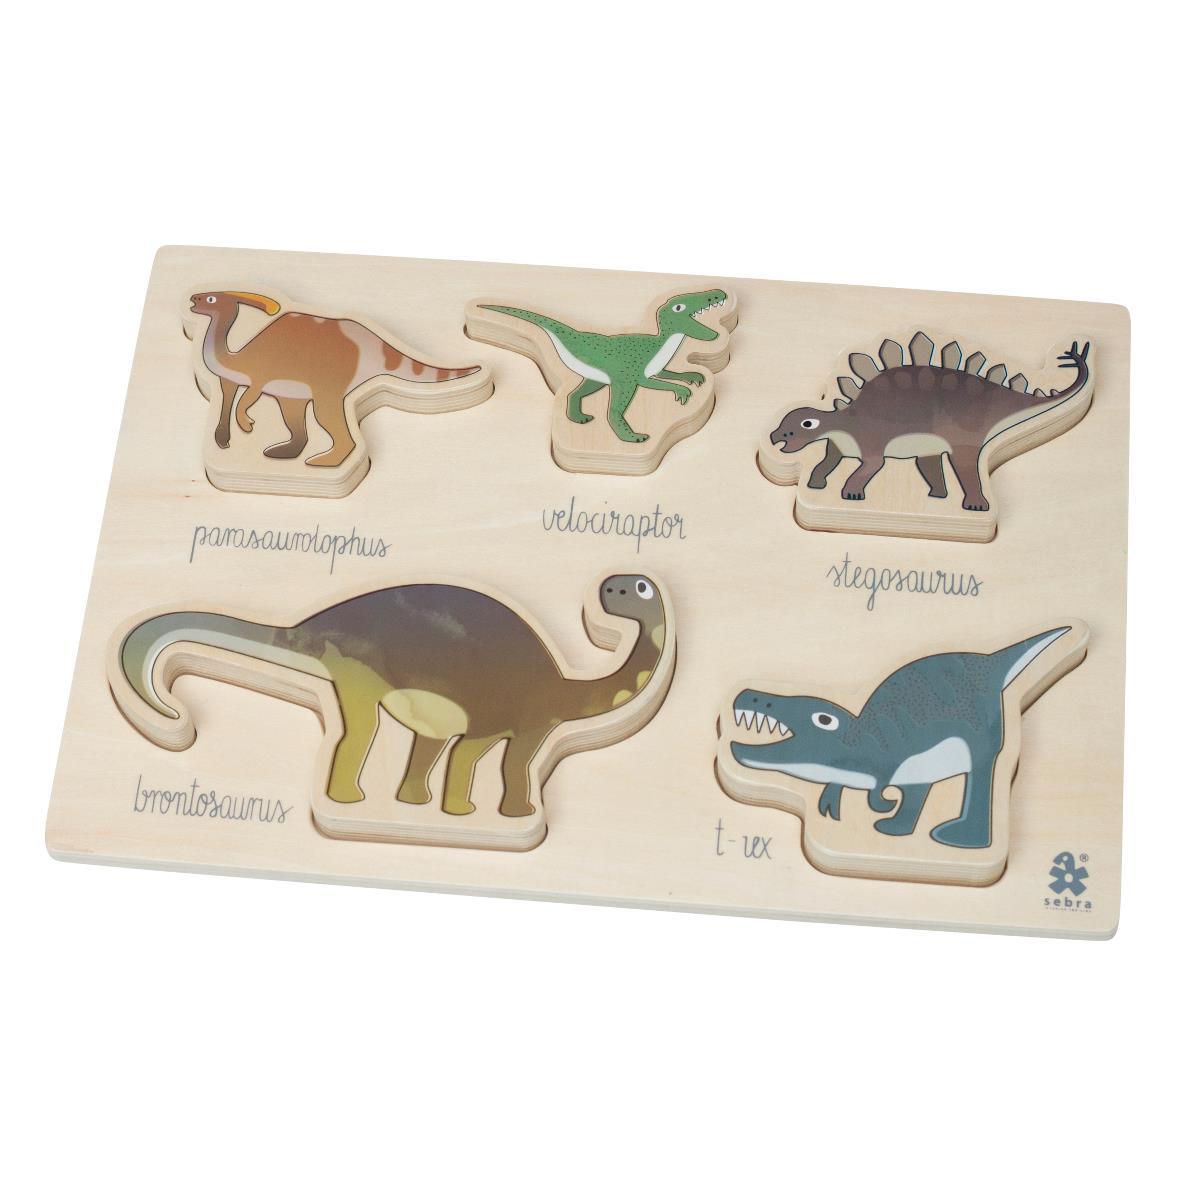 sebra Kräftiges Puzzle aus Holz, Dino 3015104 - 01